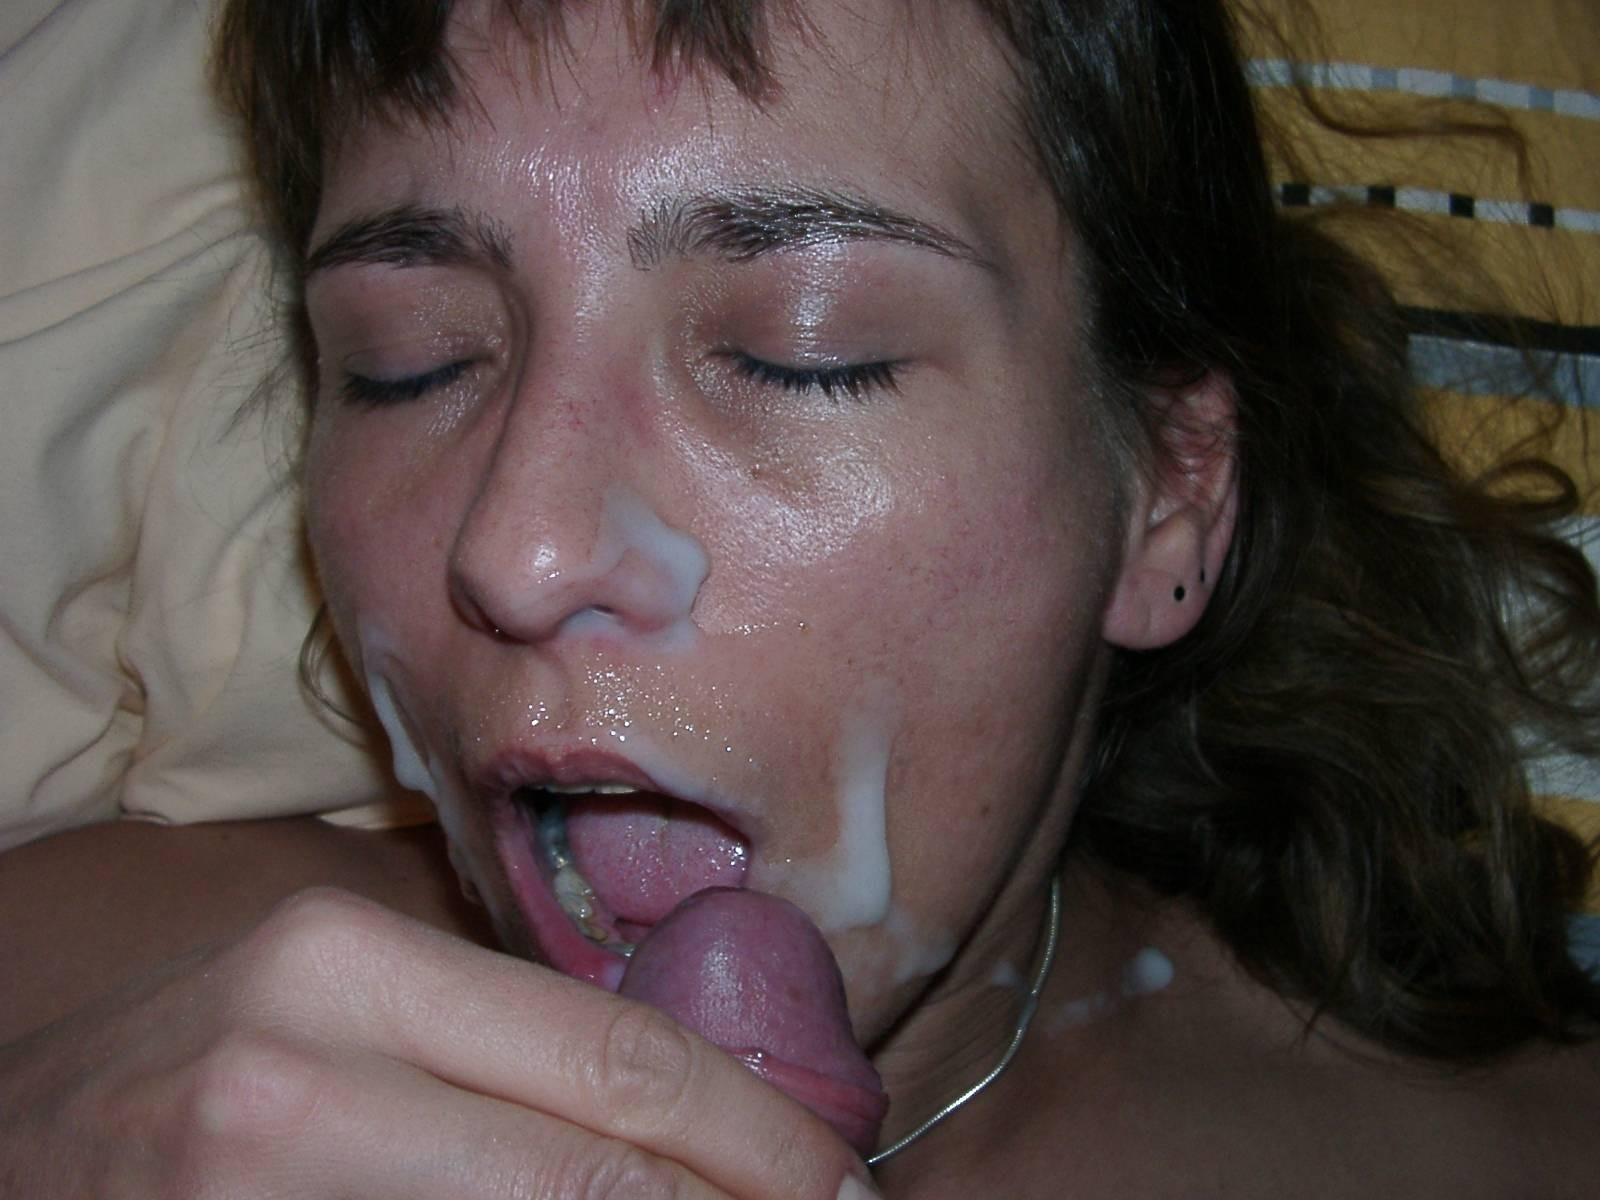 Кончил на лицо ей не нравится, частное фото секса молодоженов